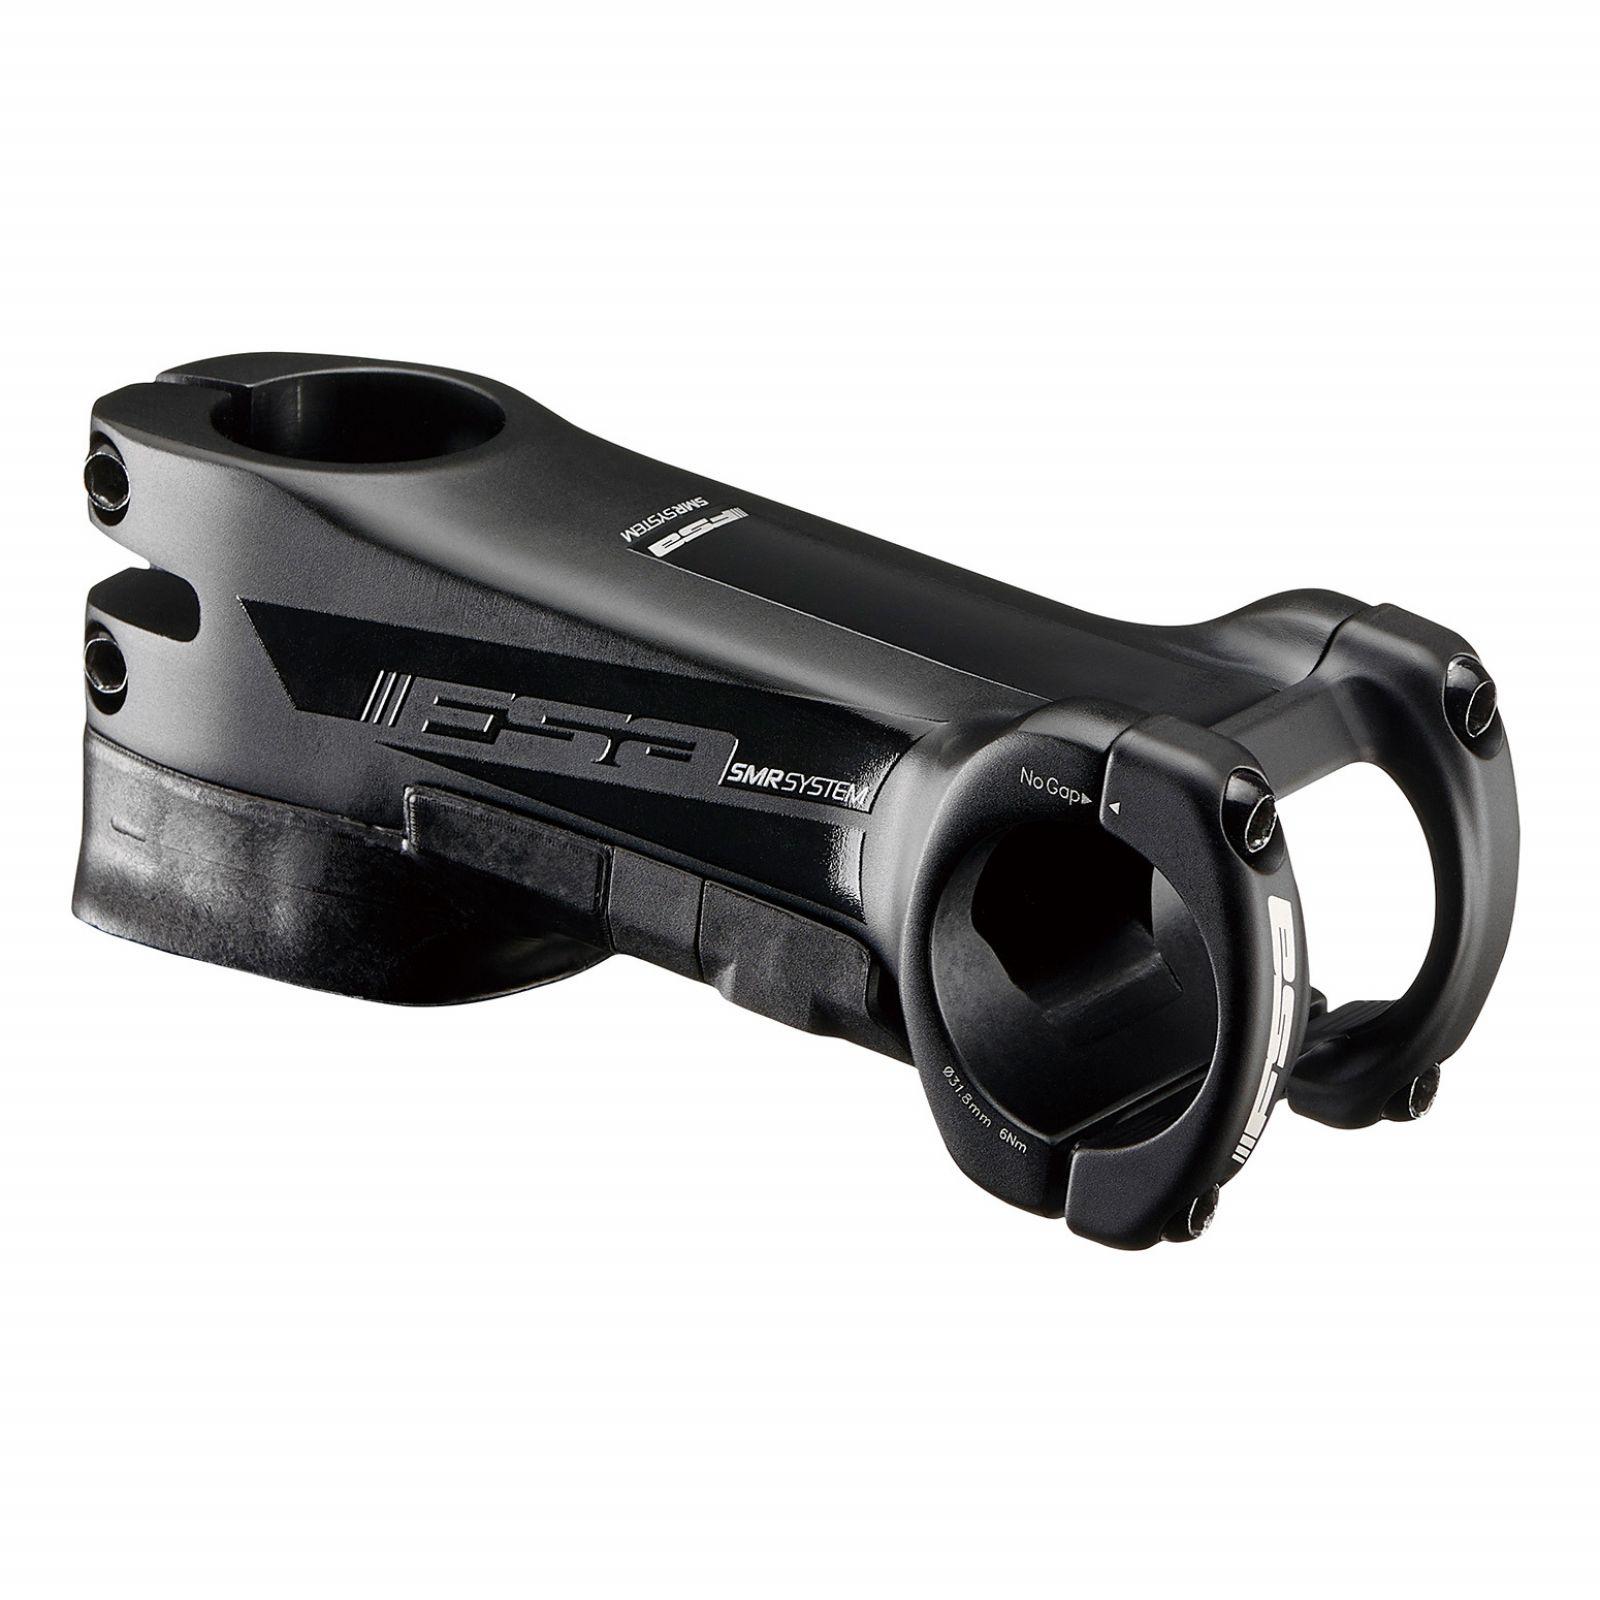 вынос FSA SMR Stem - 31.8mm - 6° - 110 мм